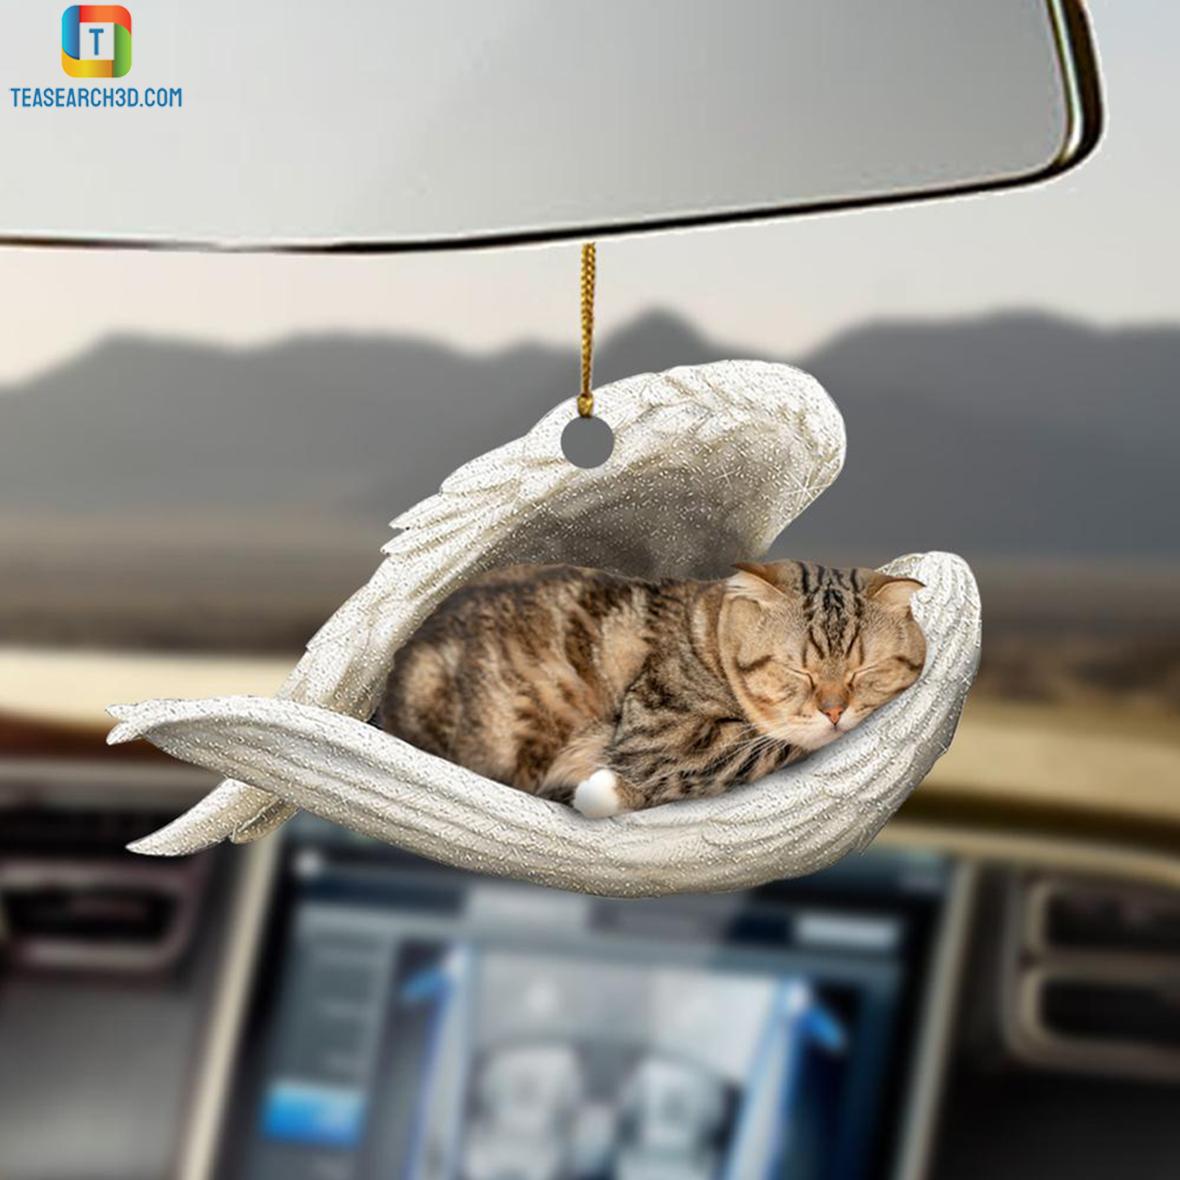 Scottish Fold sleeping angel car hanging ornament 1